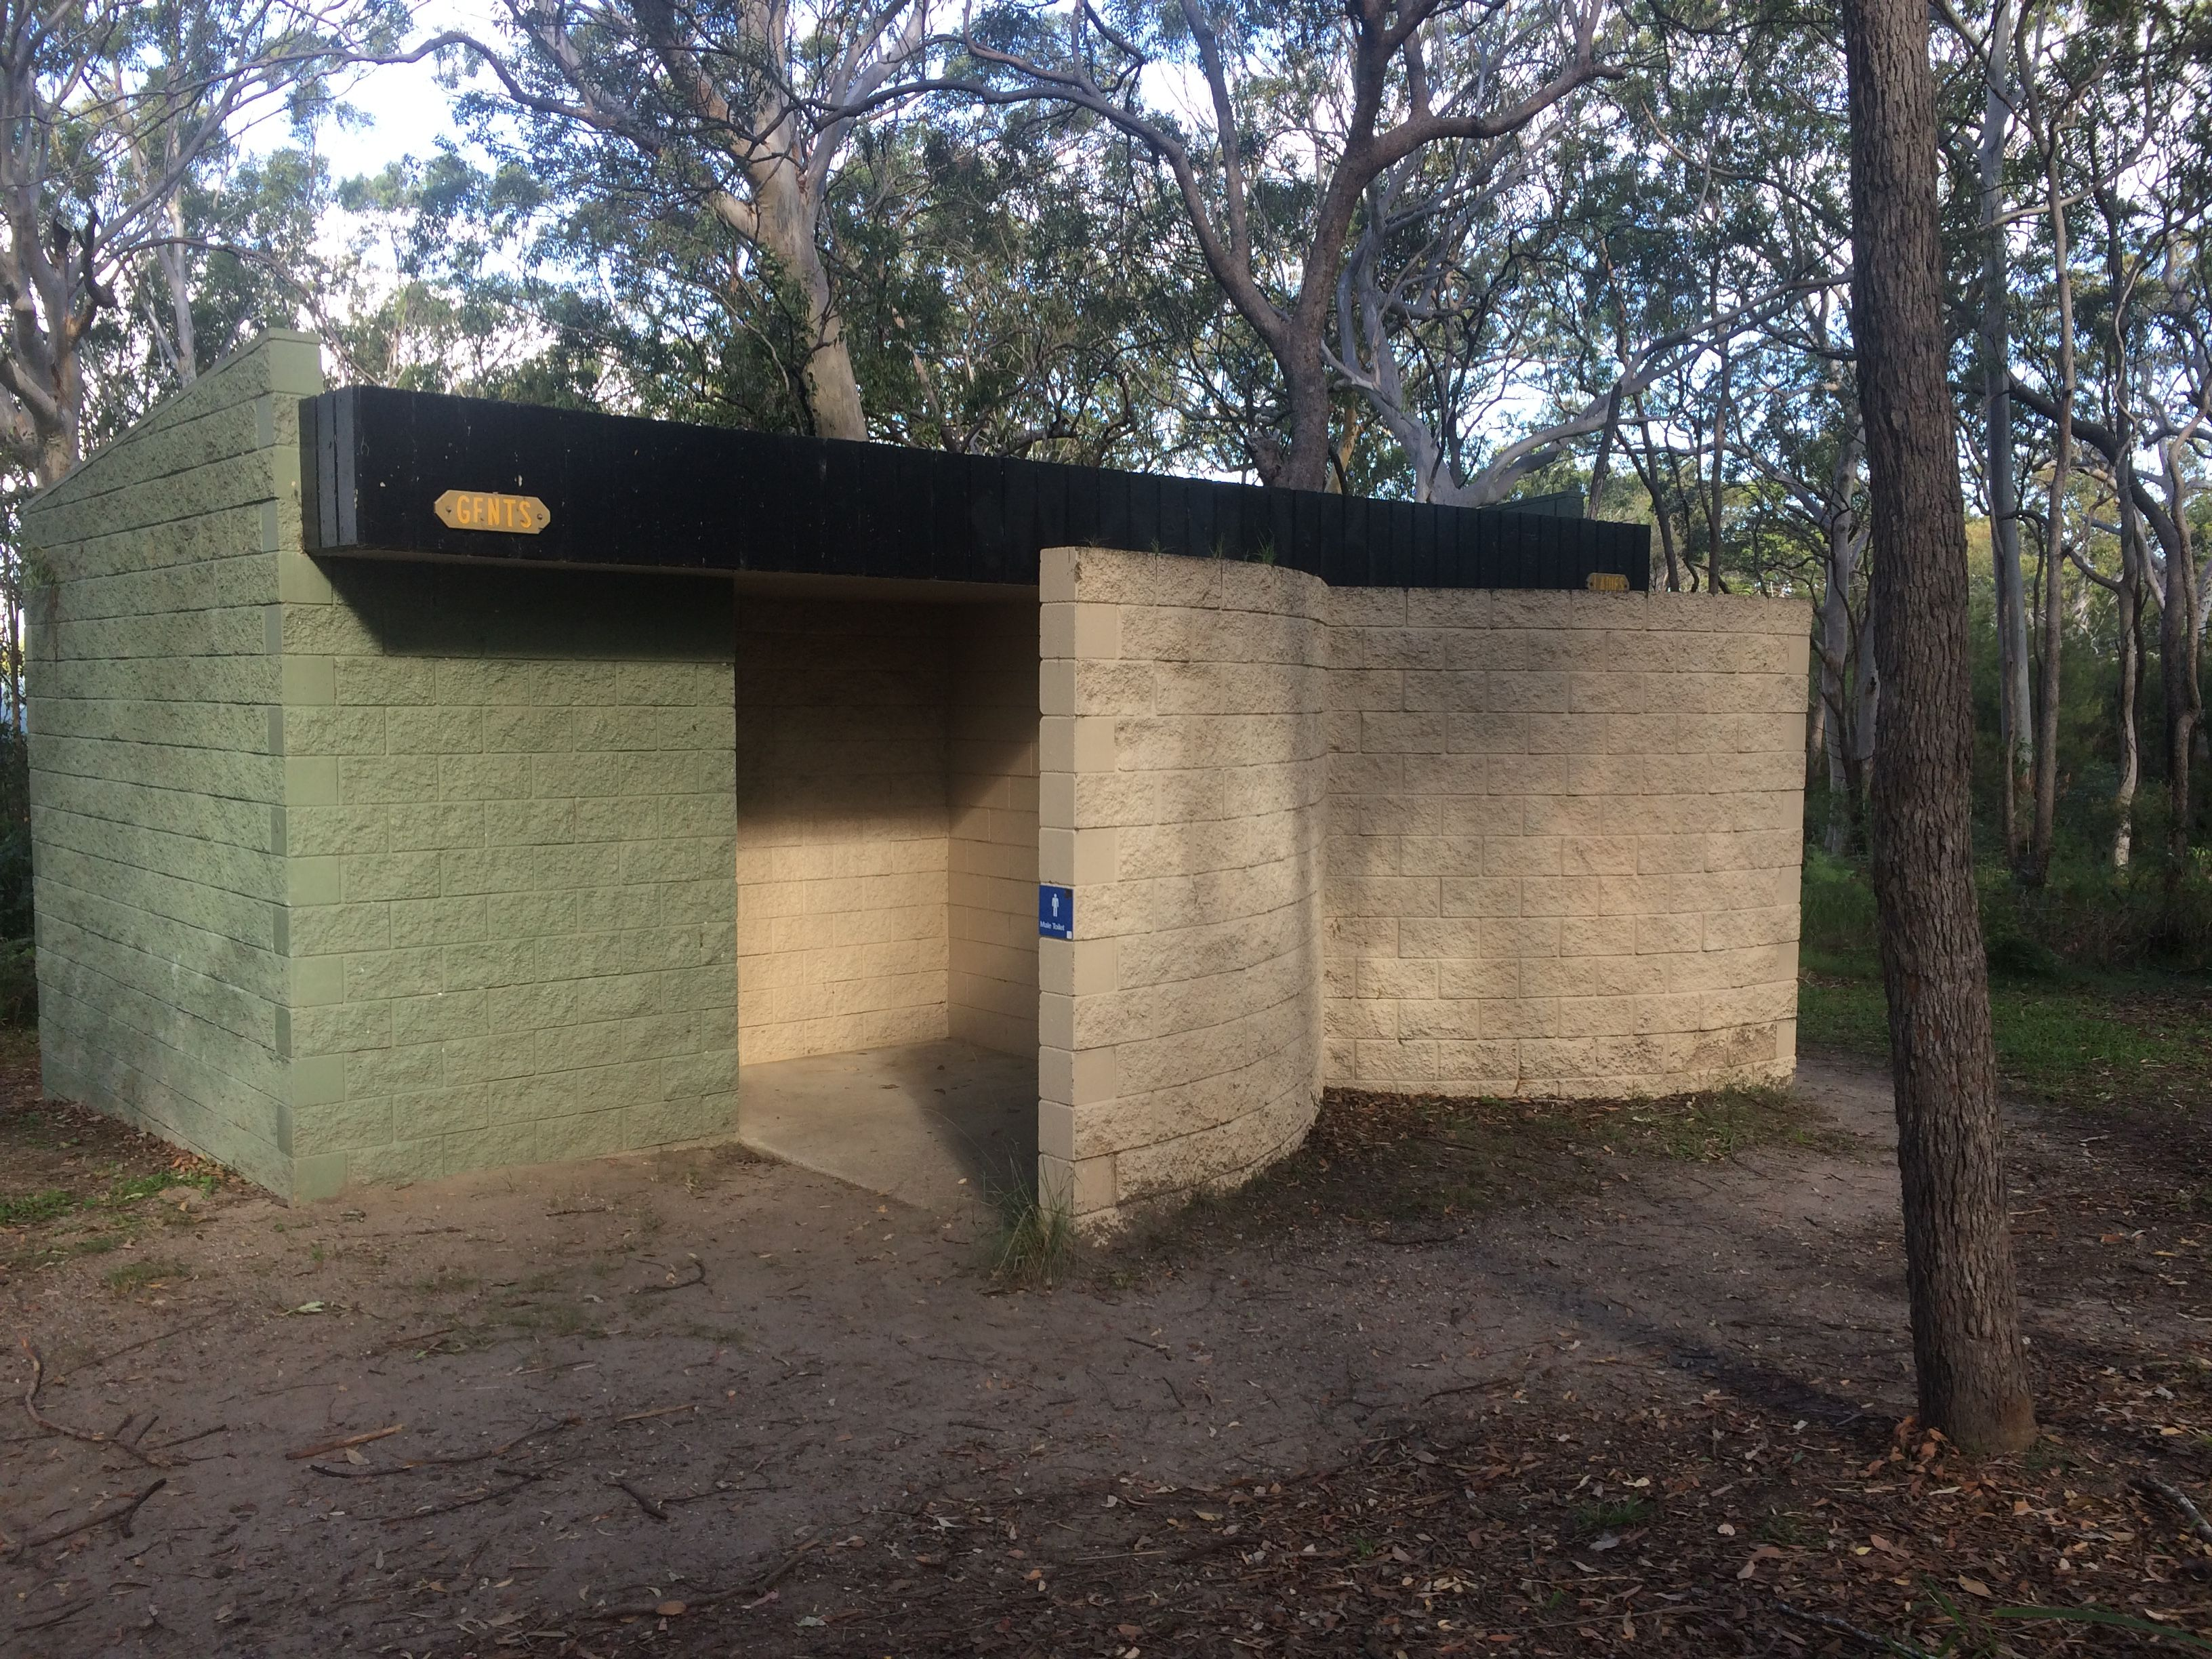 Botanic Gardens Caloundra Queensland | Architecturally Significant ... Offentliche Toilette Park Landschaft